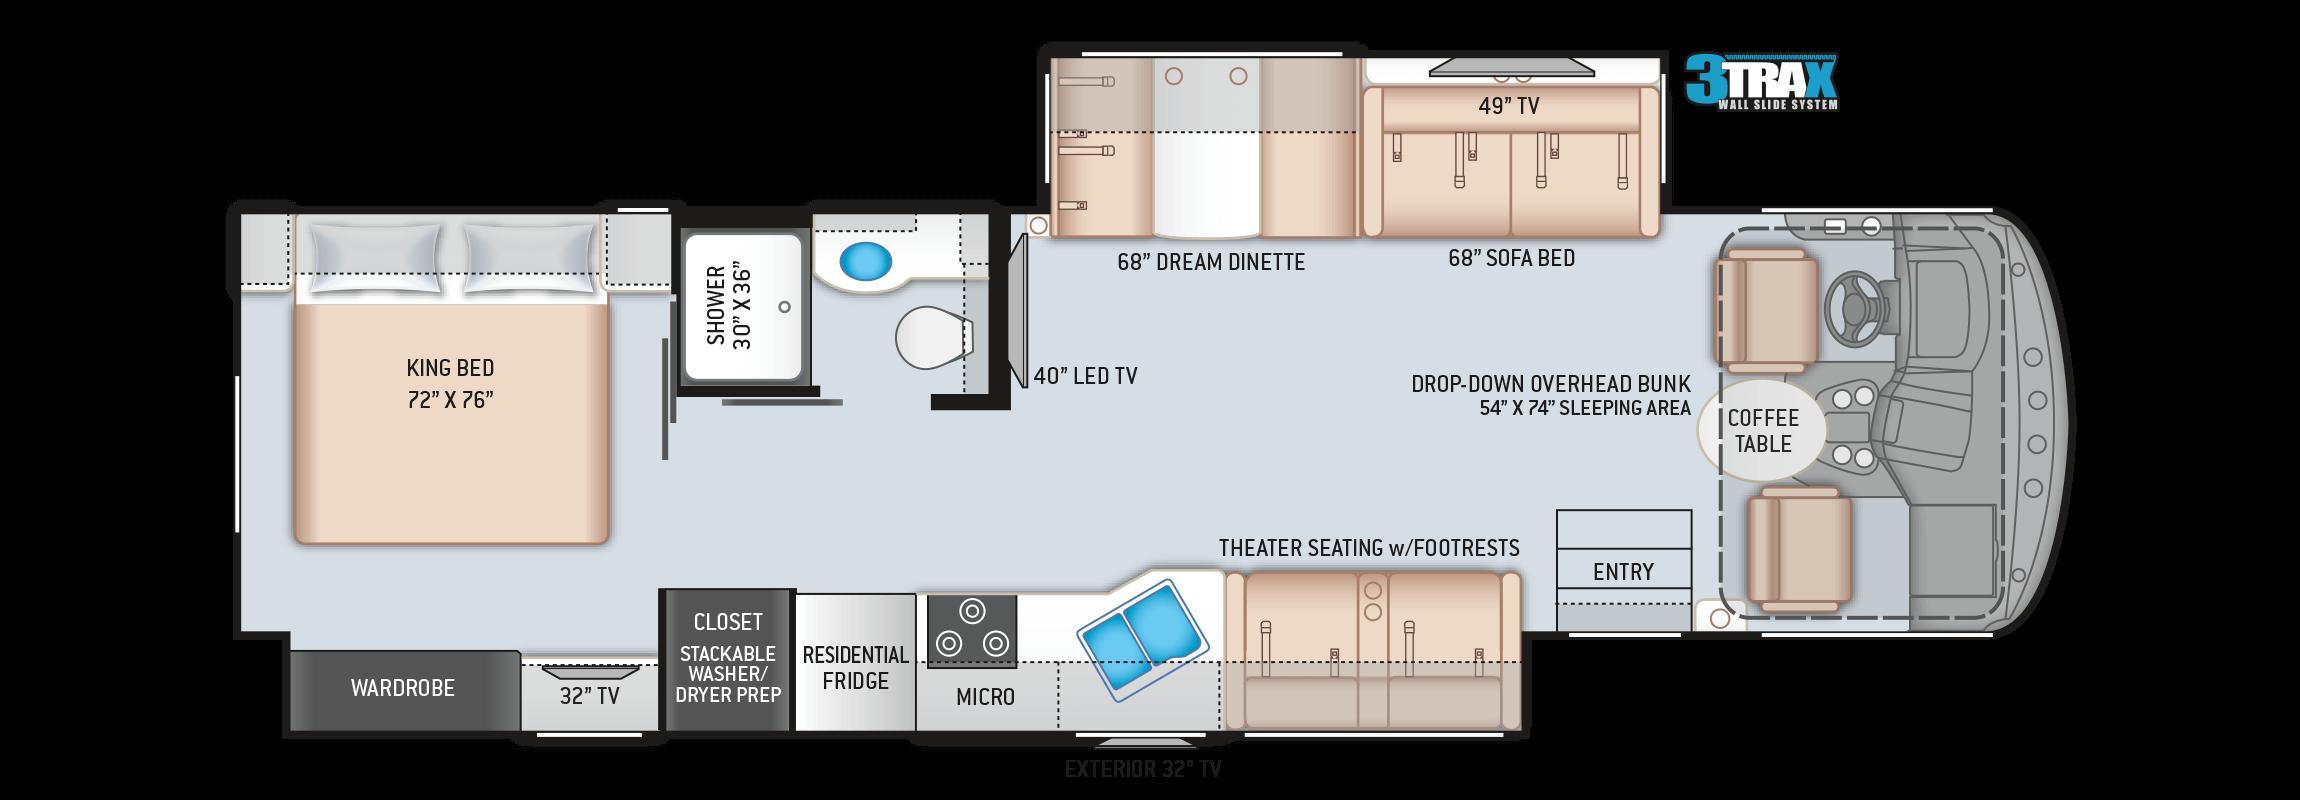 Floorplan of a 34R Windsport RV Rental